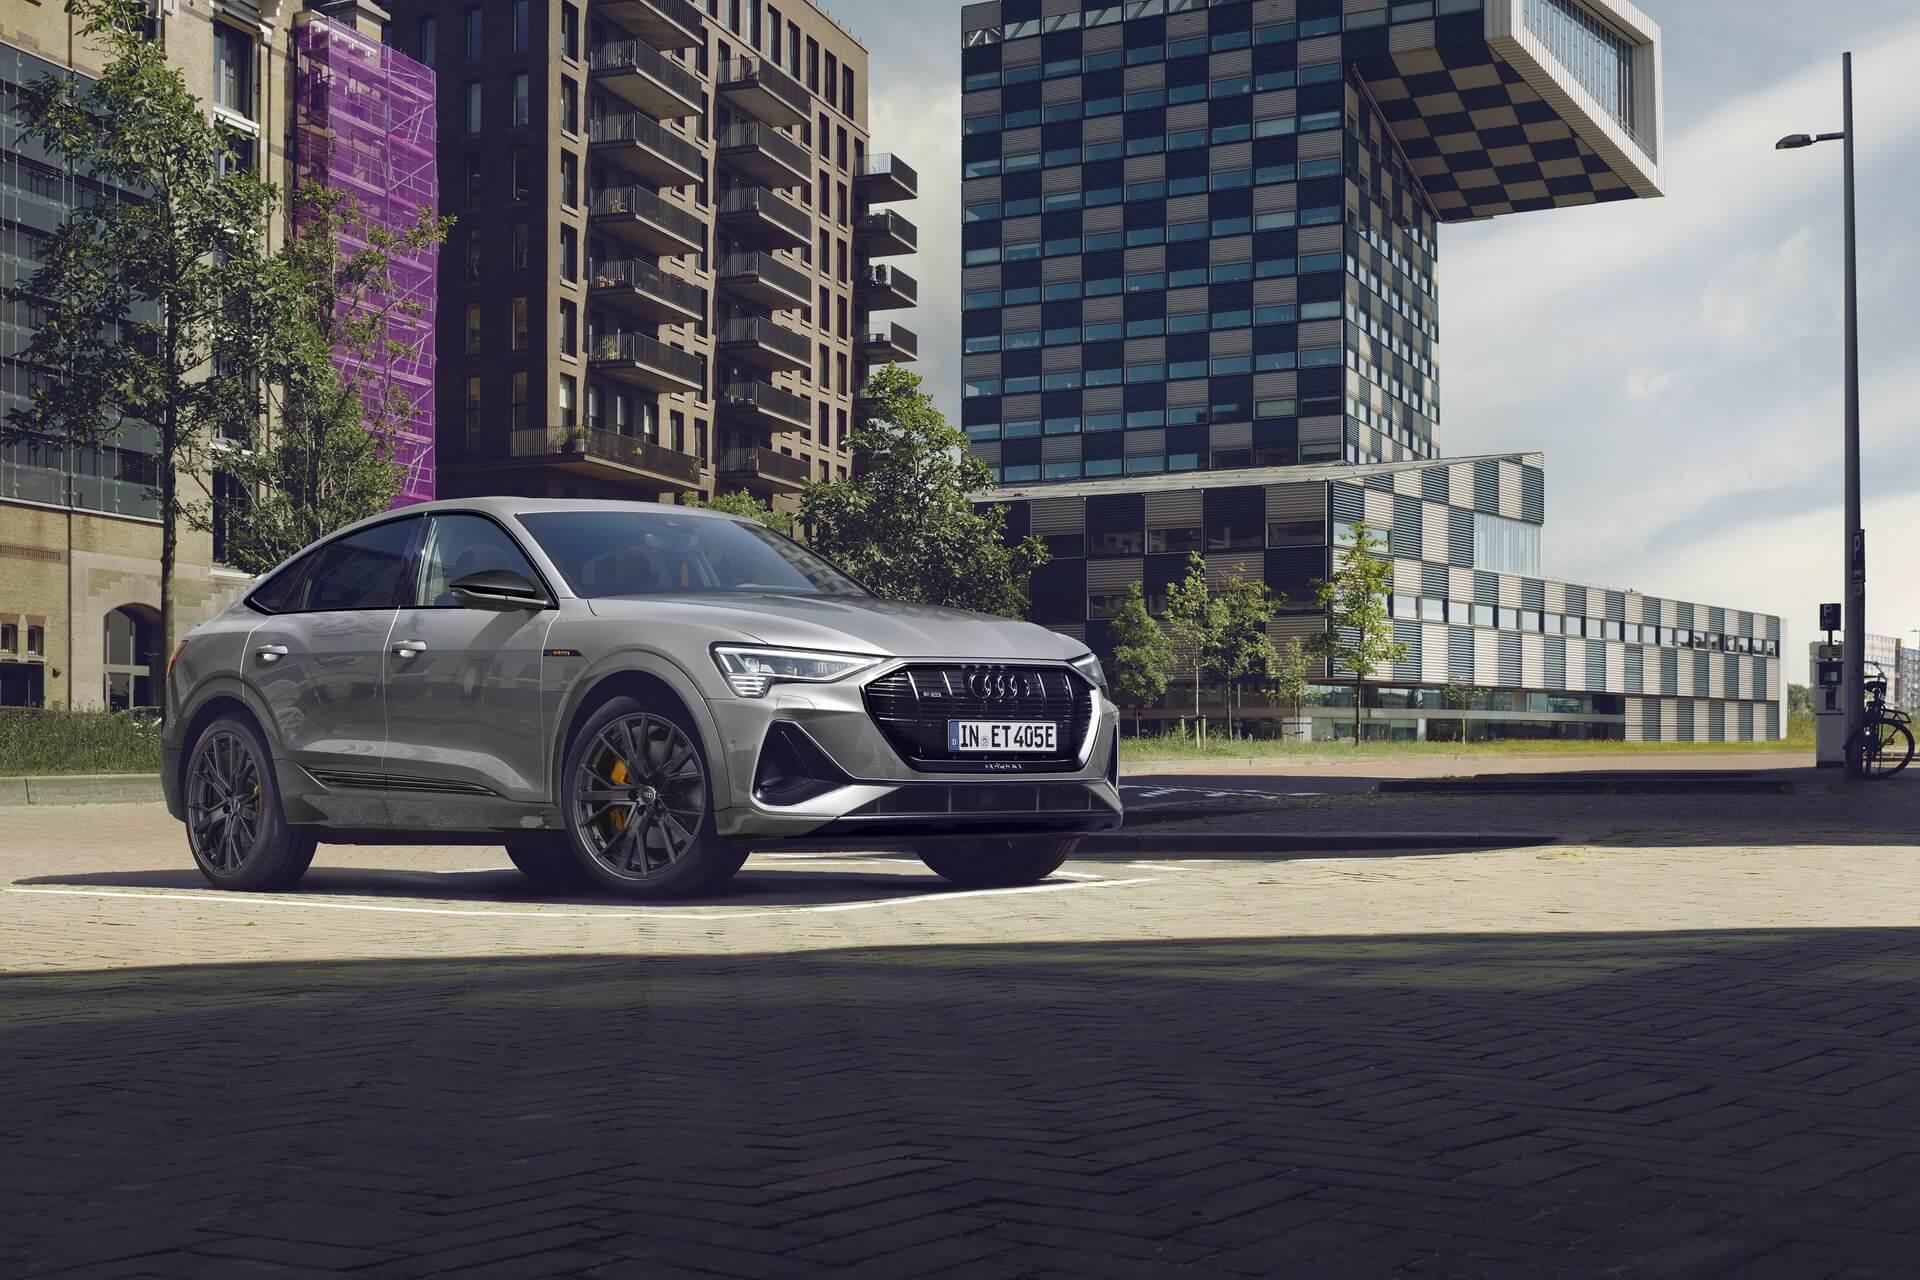 Семейство Audi e-tron получило новое исполнение S line black edition